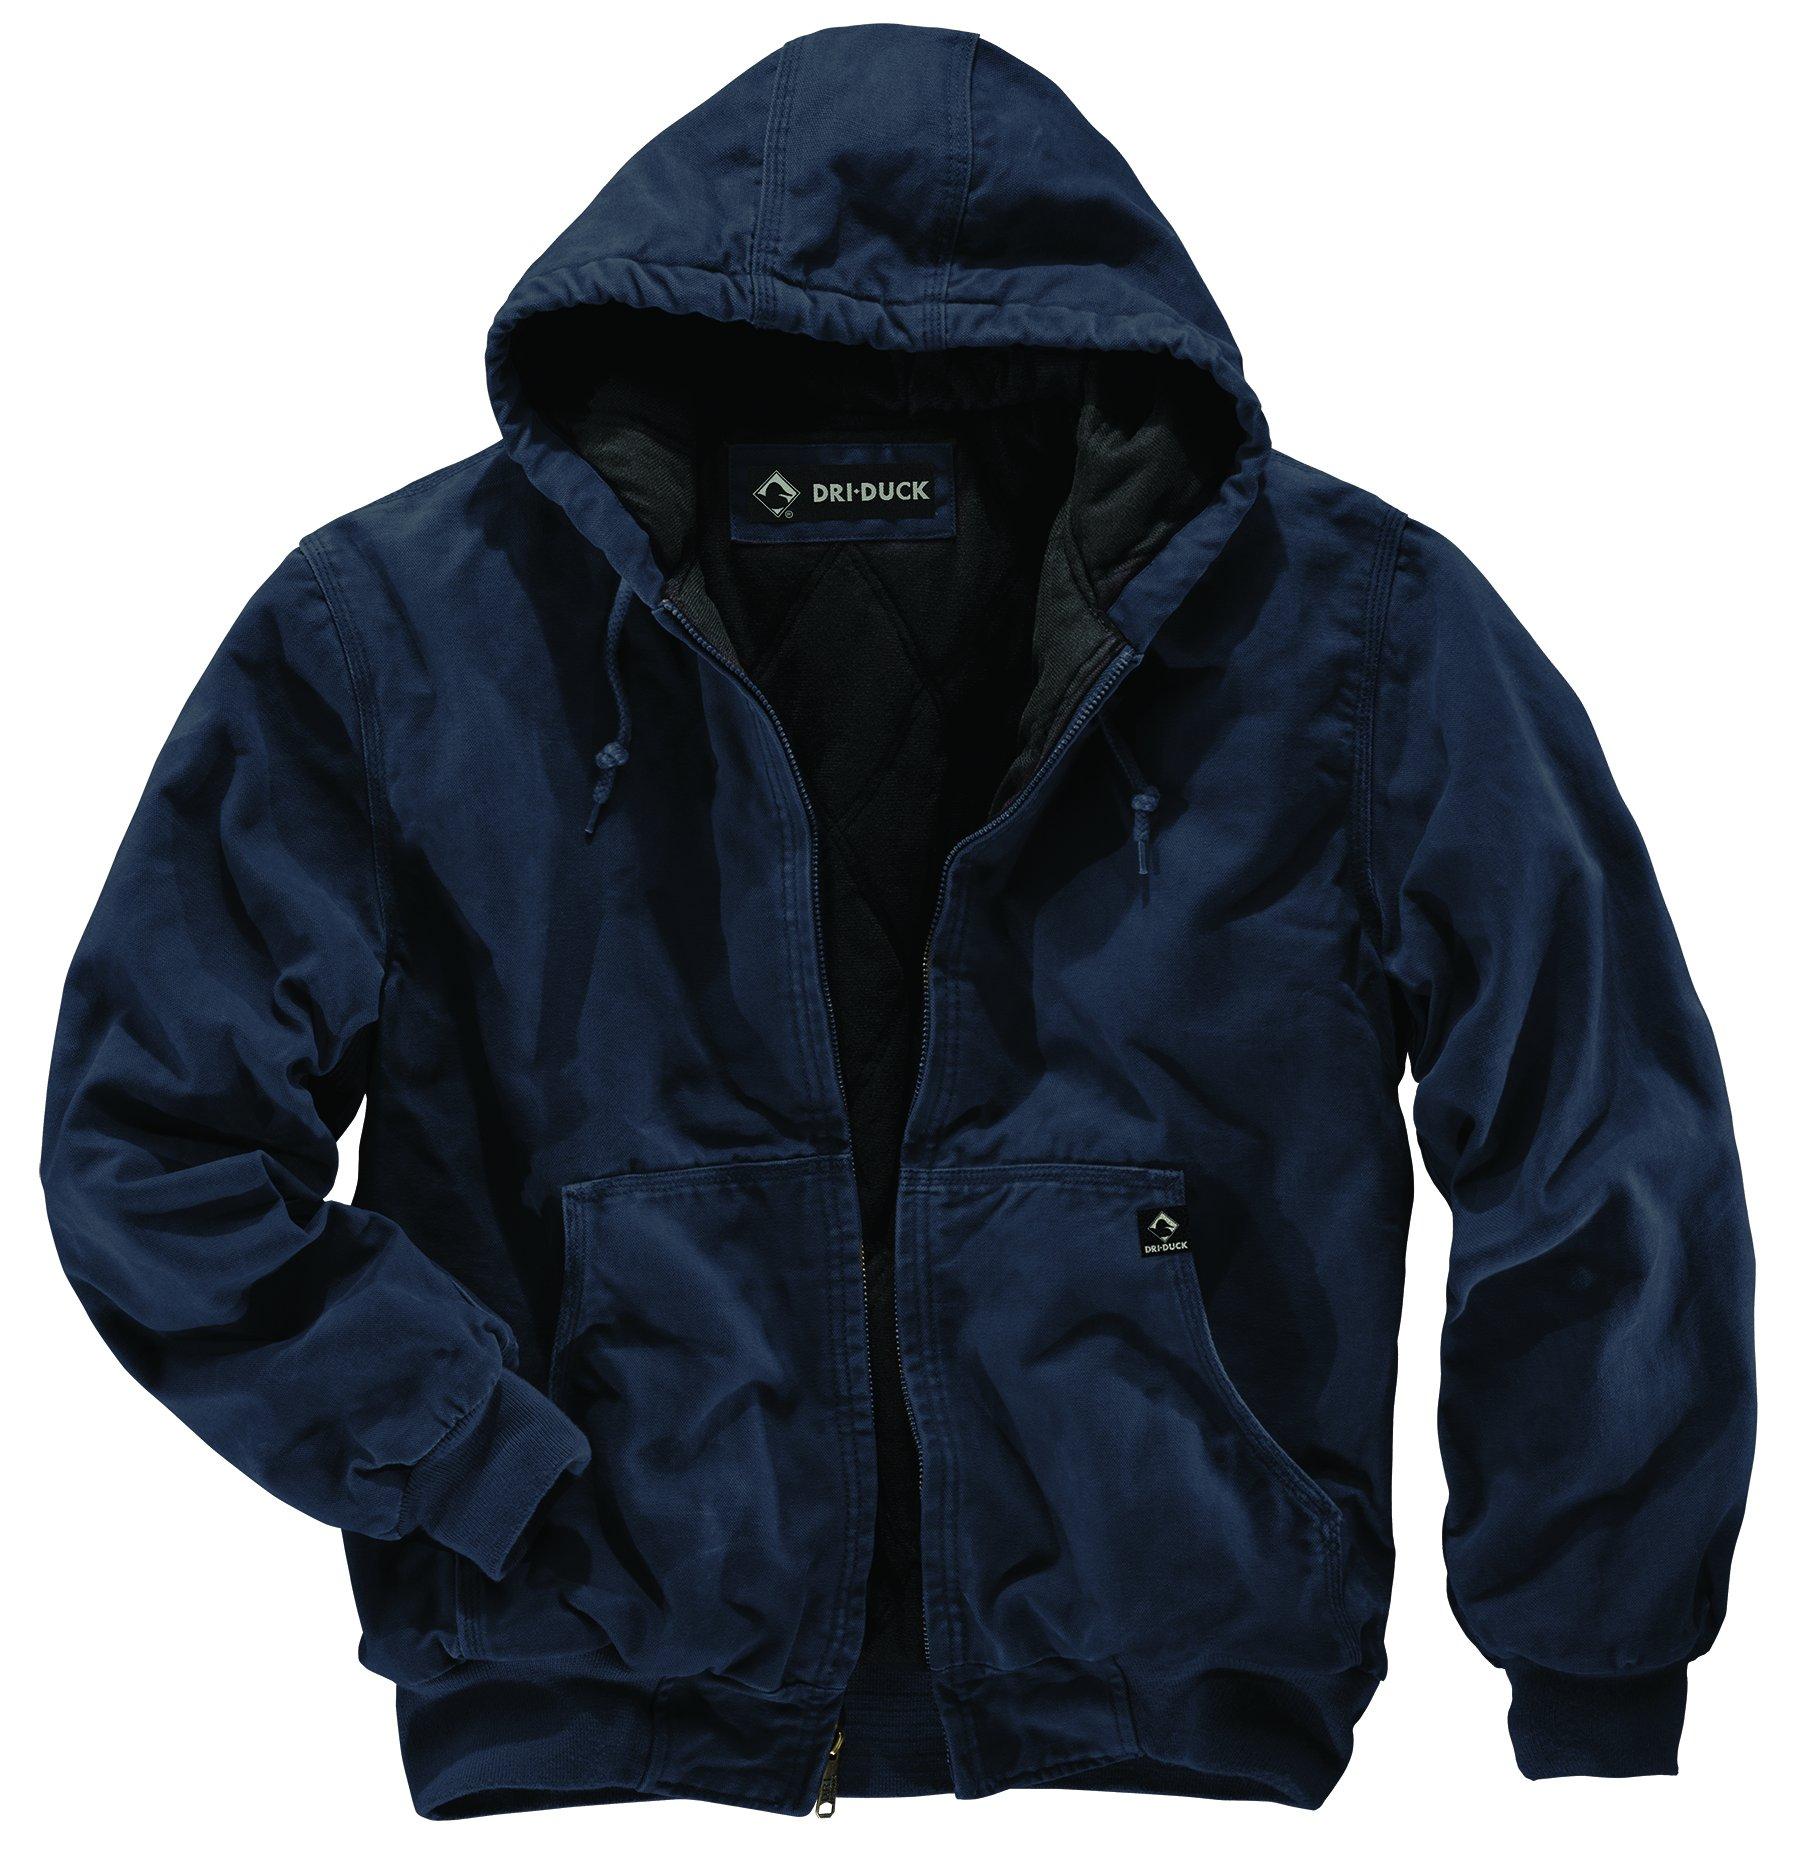 DRI Duck Men's 5020 Cheyenne Hooded Work Jacket, Navy, Large by DRI Duck